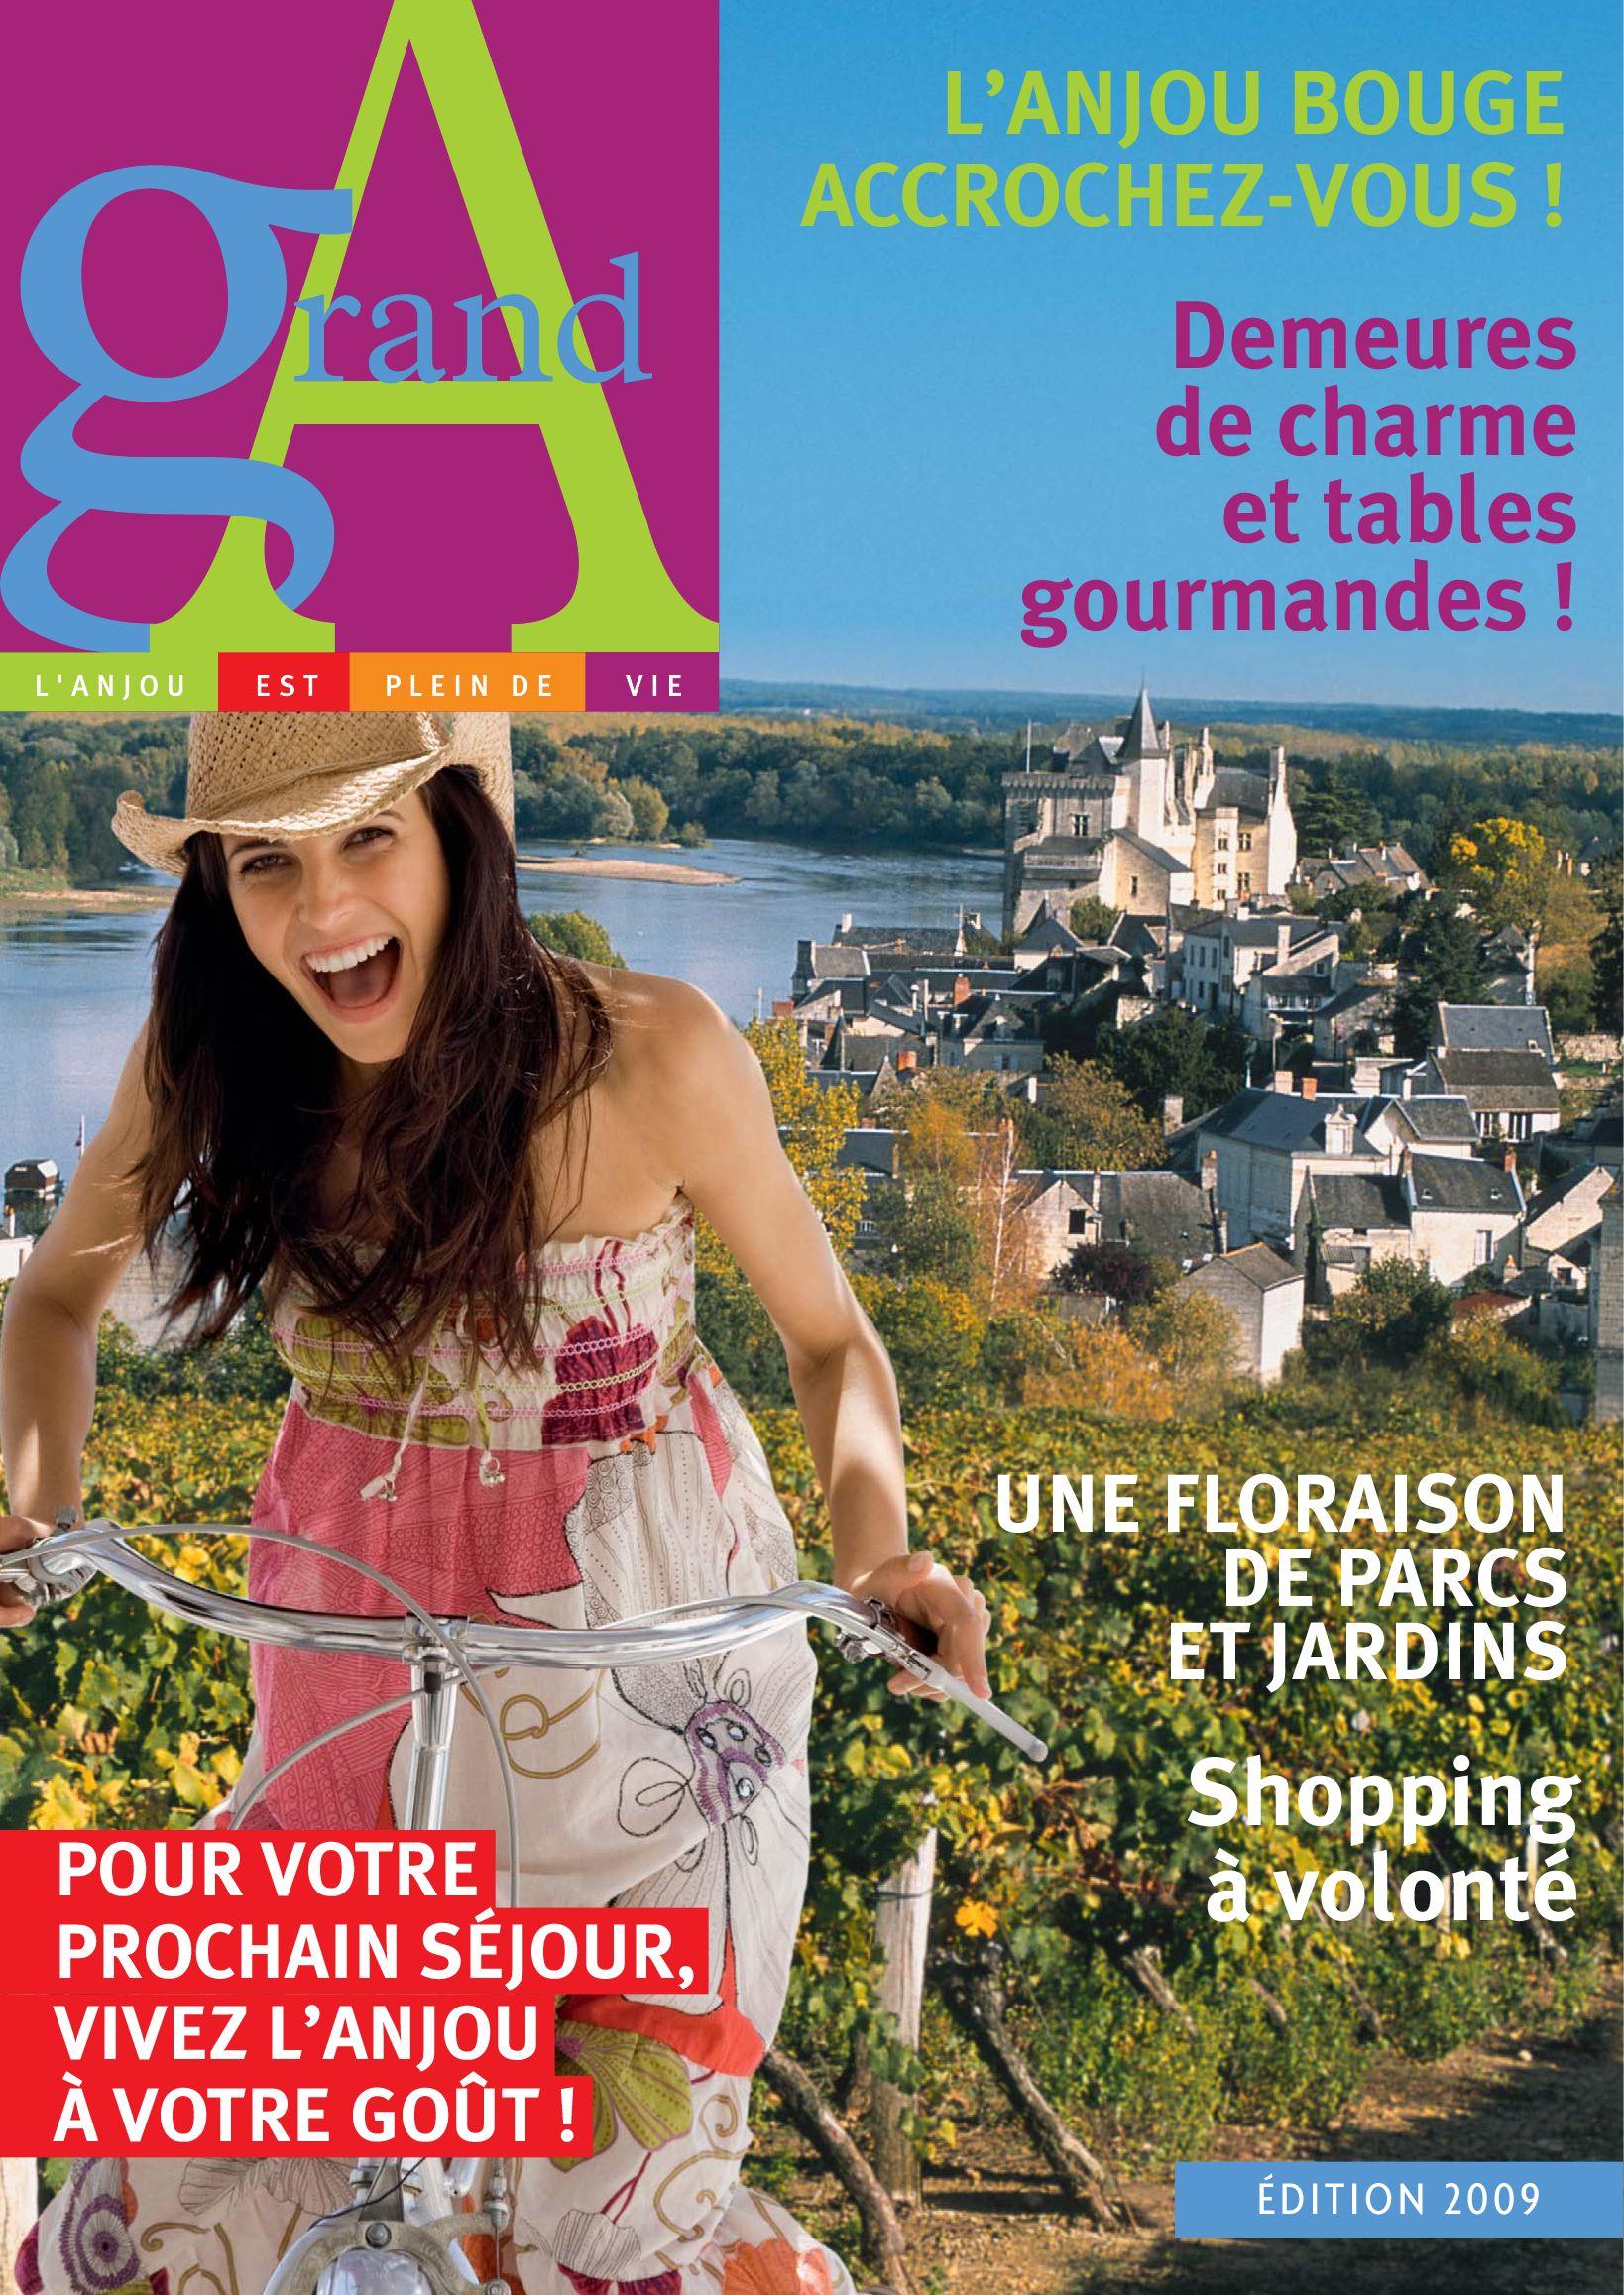 20064f621a8c30 Maine-et-Loire - Brochure by Frans Bureau voor Toerisme - issuu